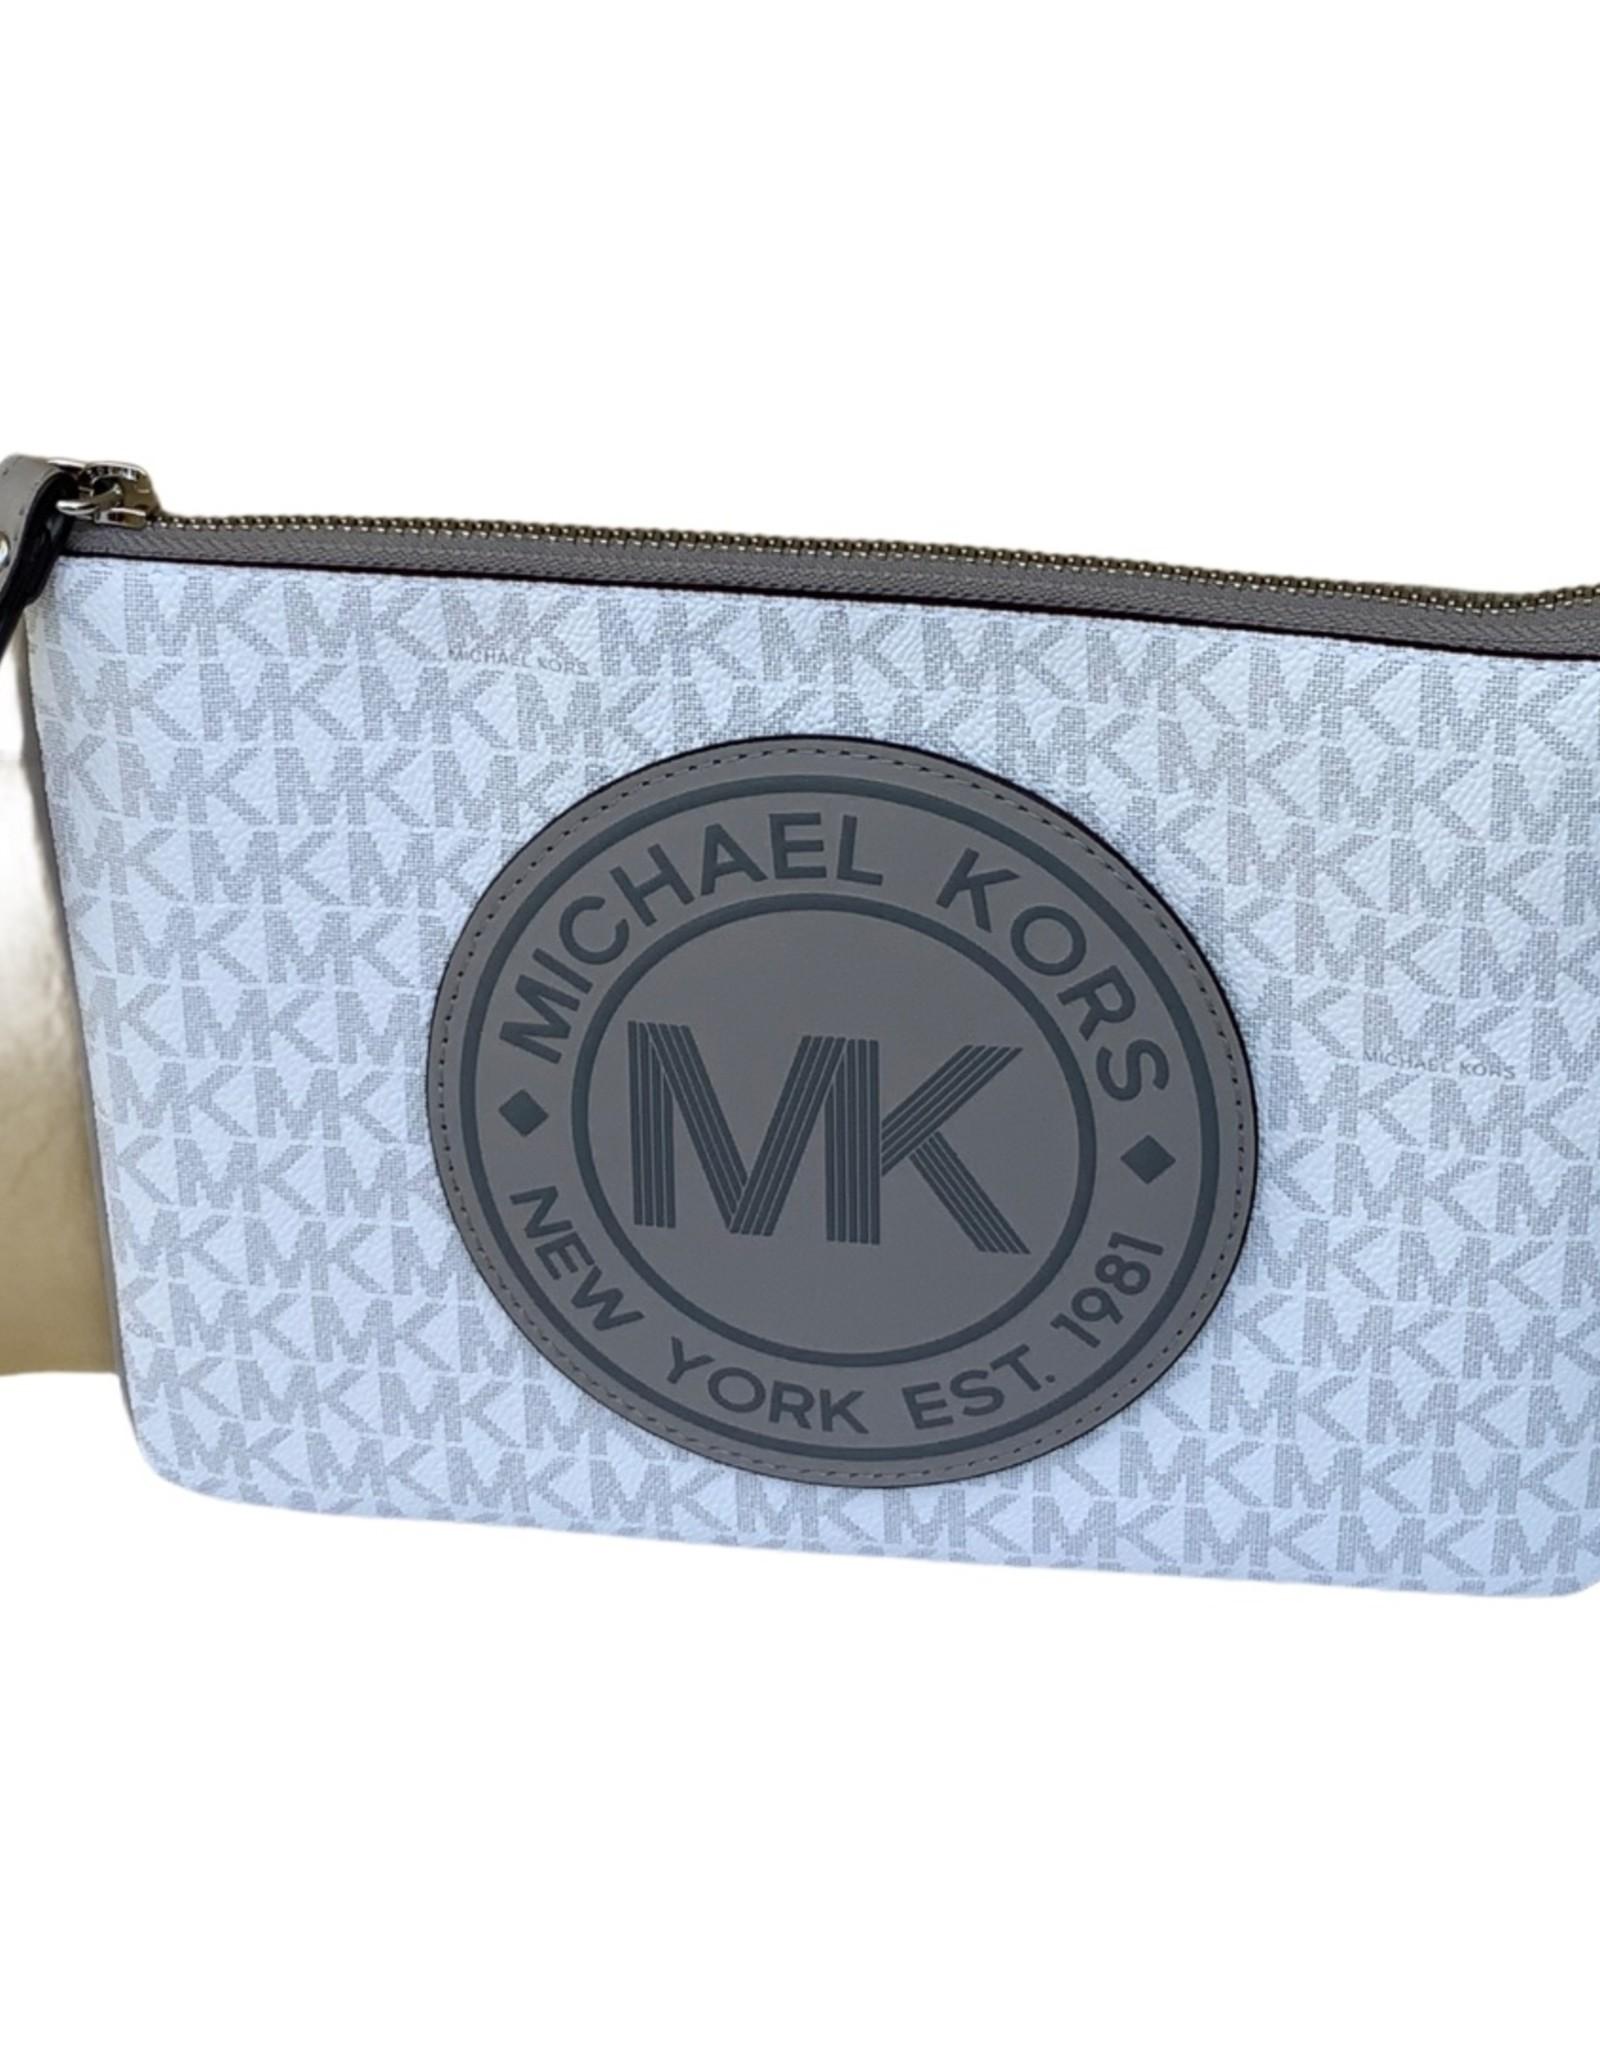 Michael Kors Michael Kors Clutch Wristlet Fulton Sport w/ Zip